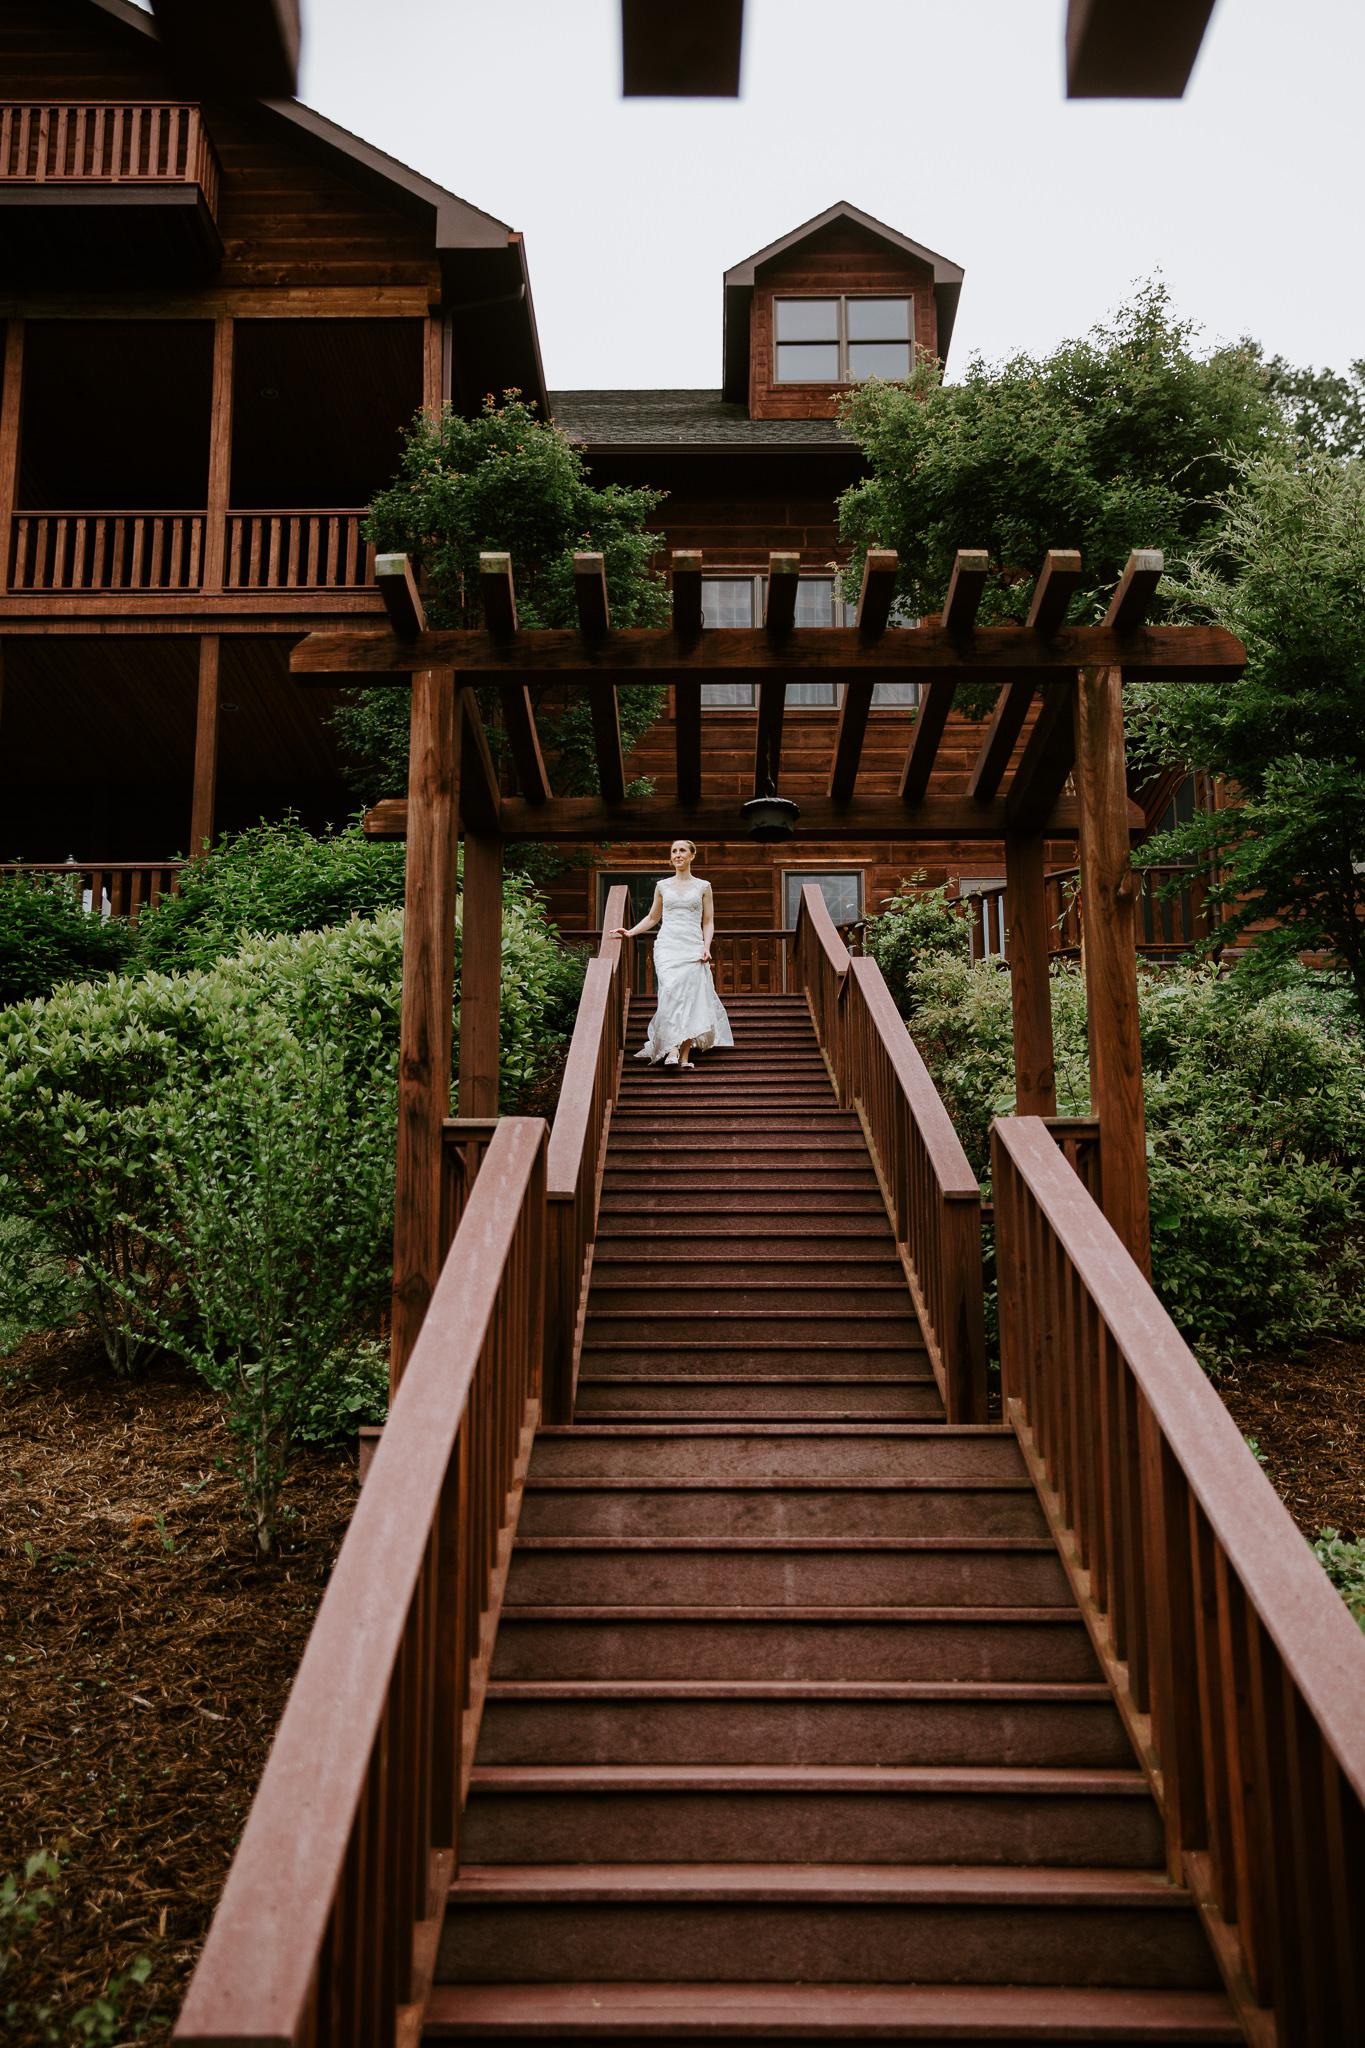 House Mountain Inn - Weddings - Lexington - Virginia - Best Wedding Photographer - Pat Cori Photography-20.jpg